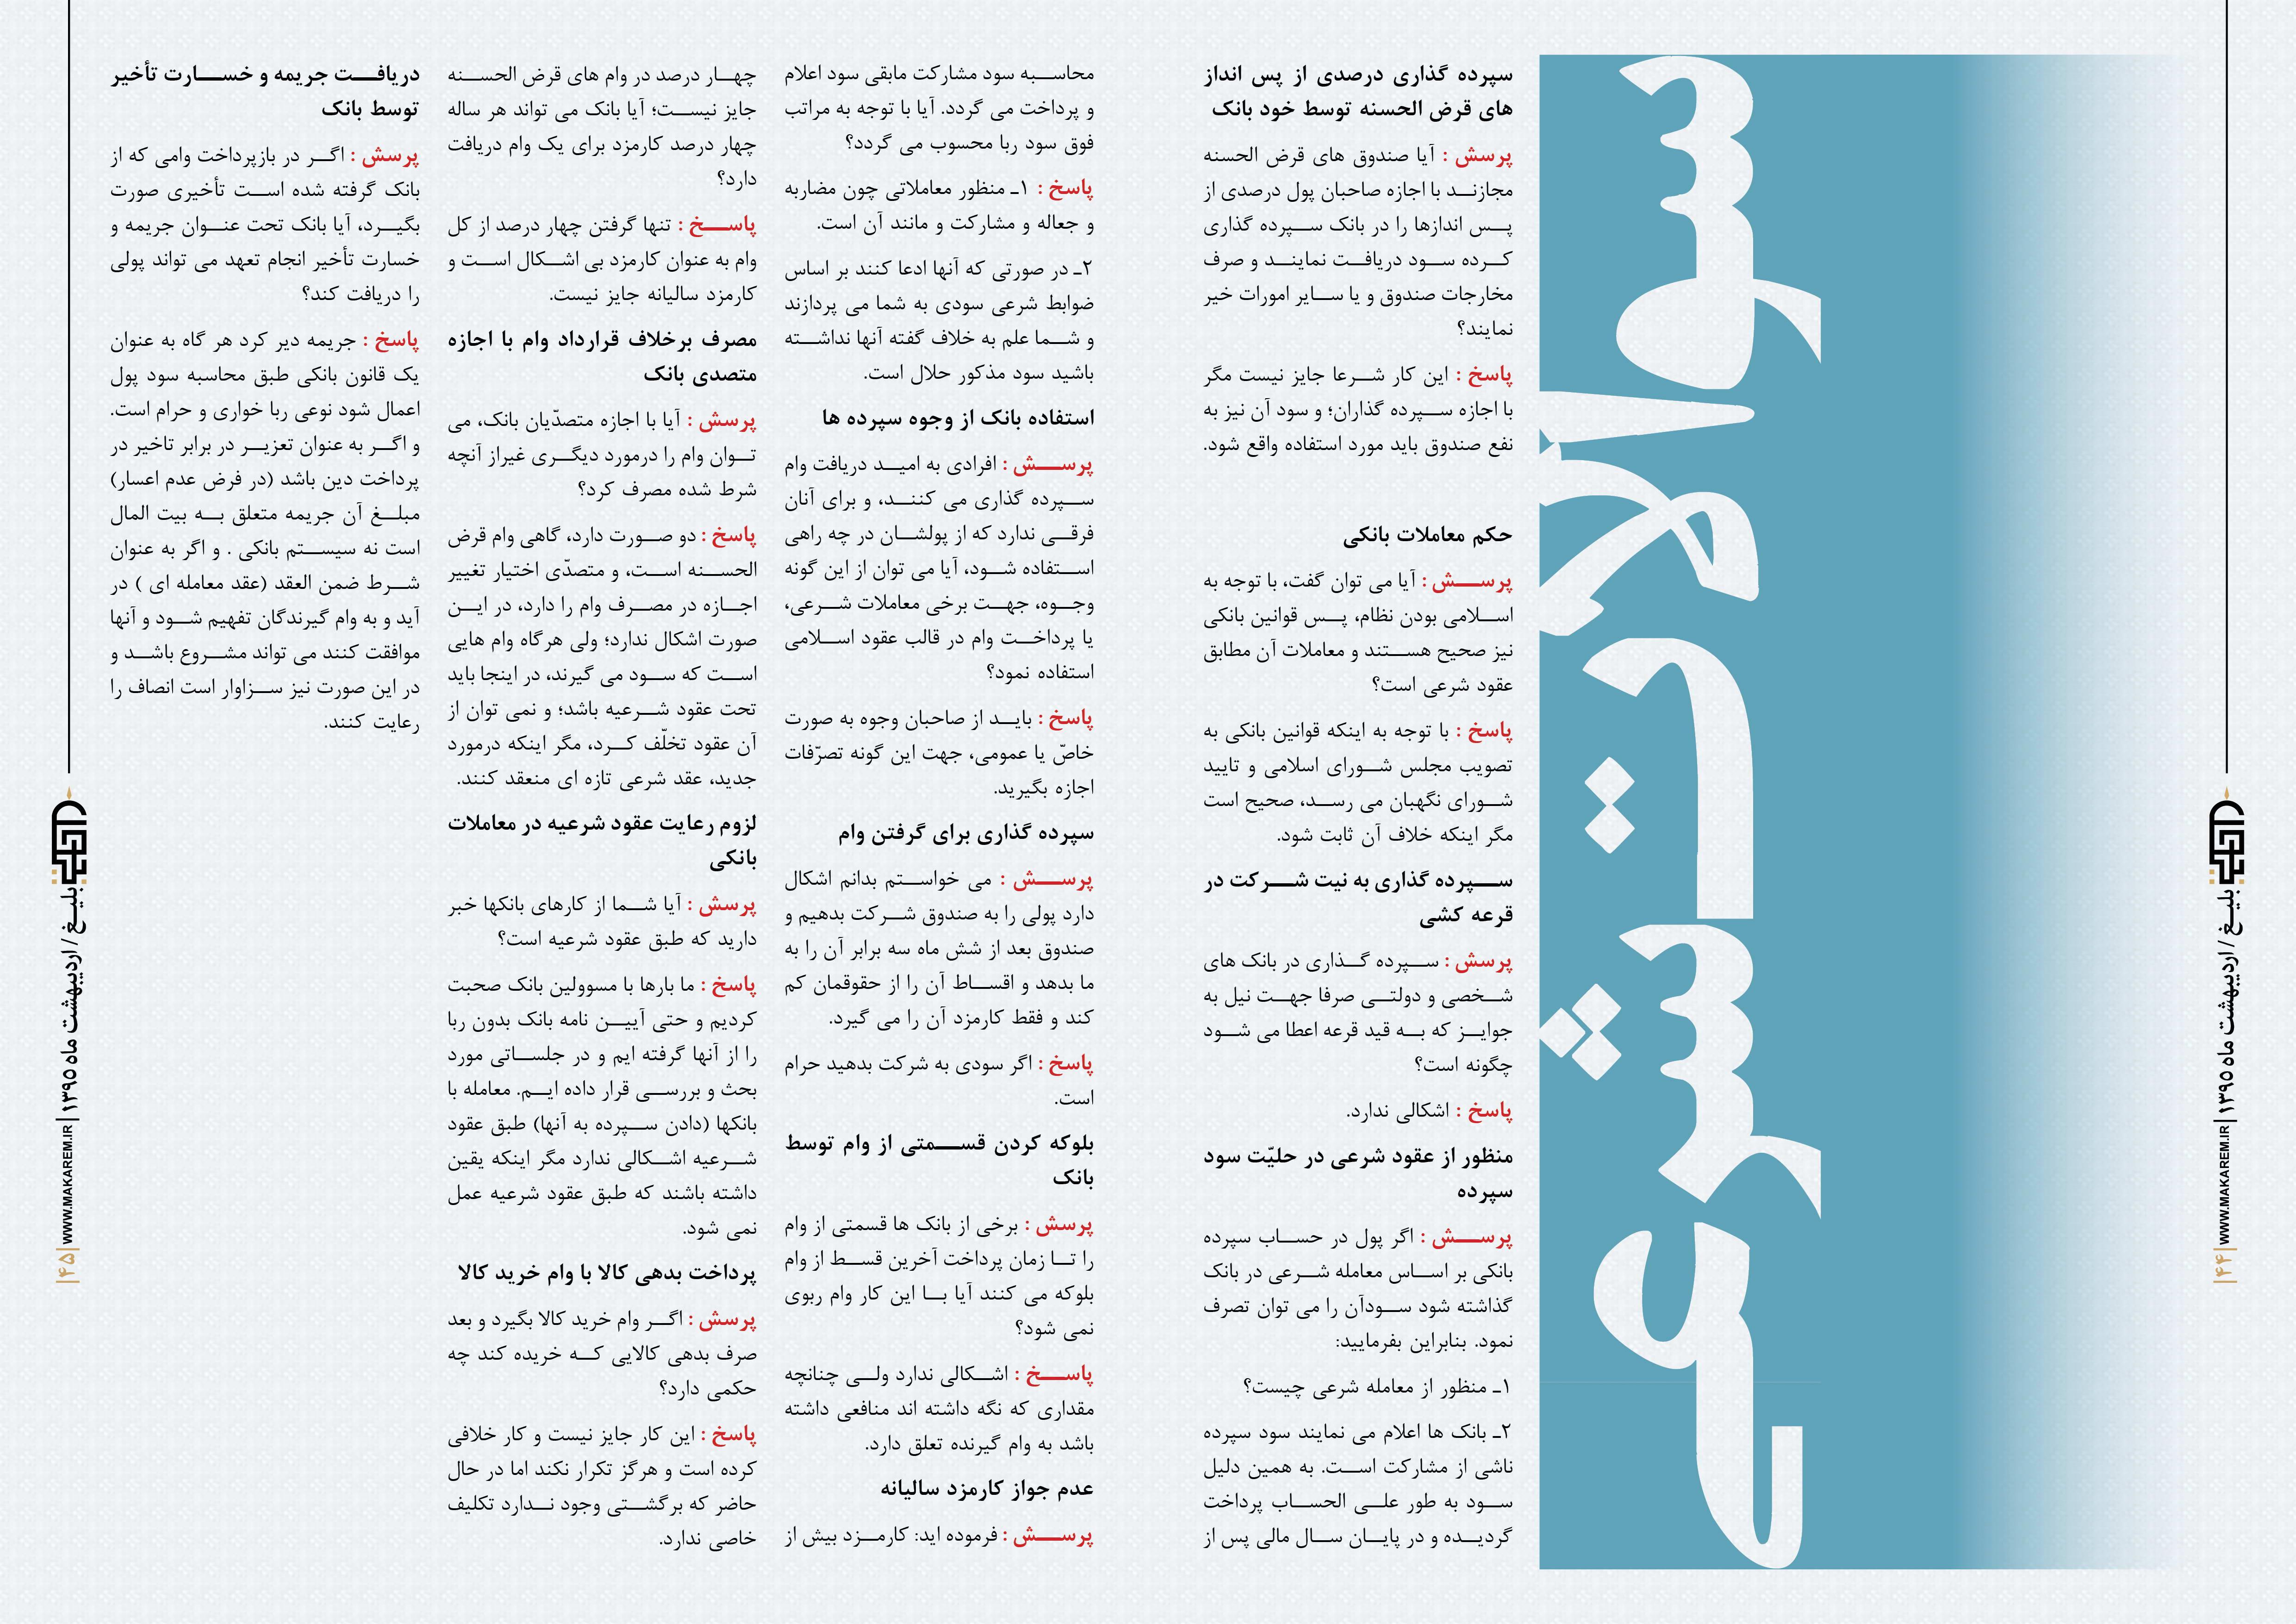 23-مدرسه الامام امیر المومنین (ع)